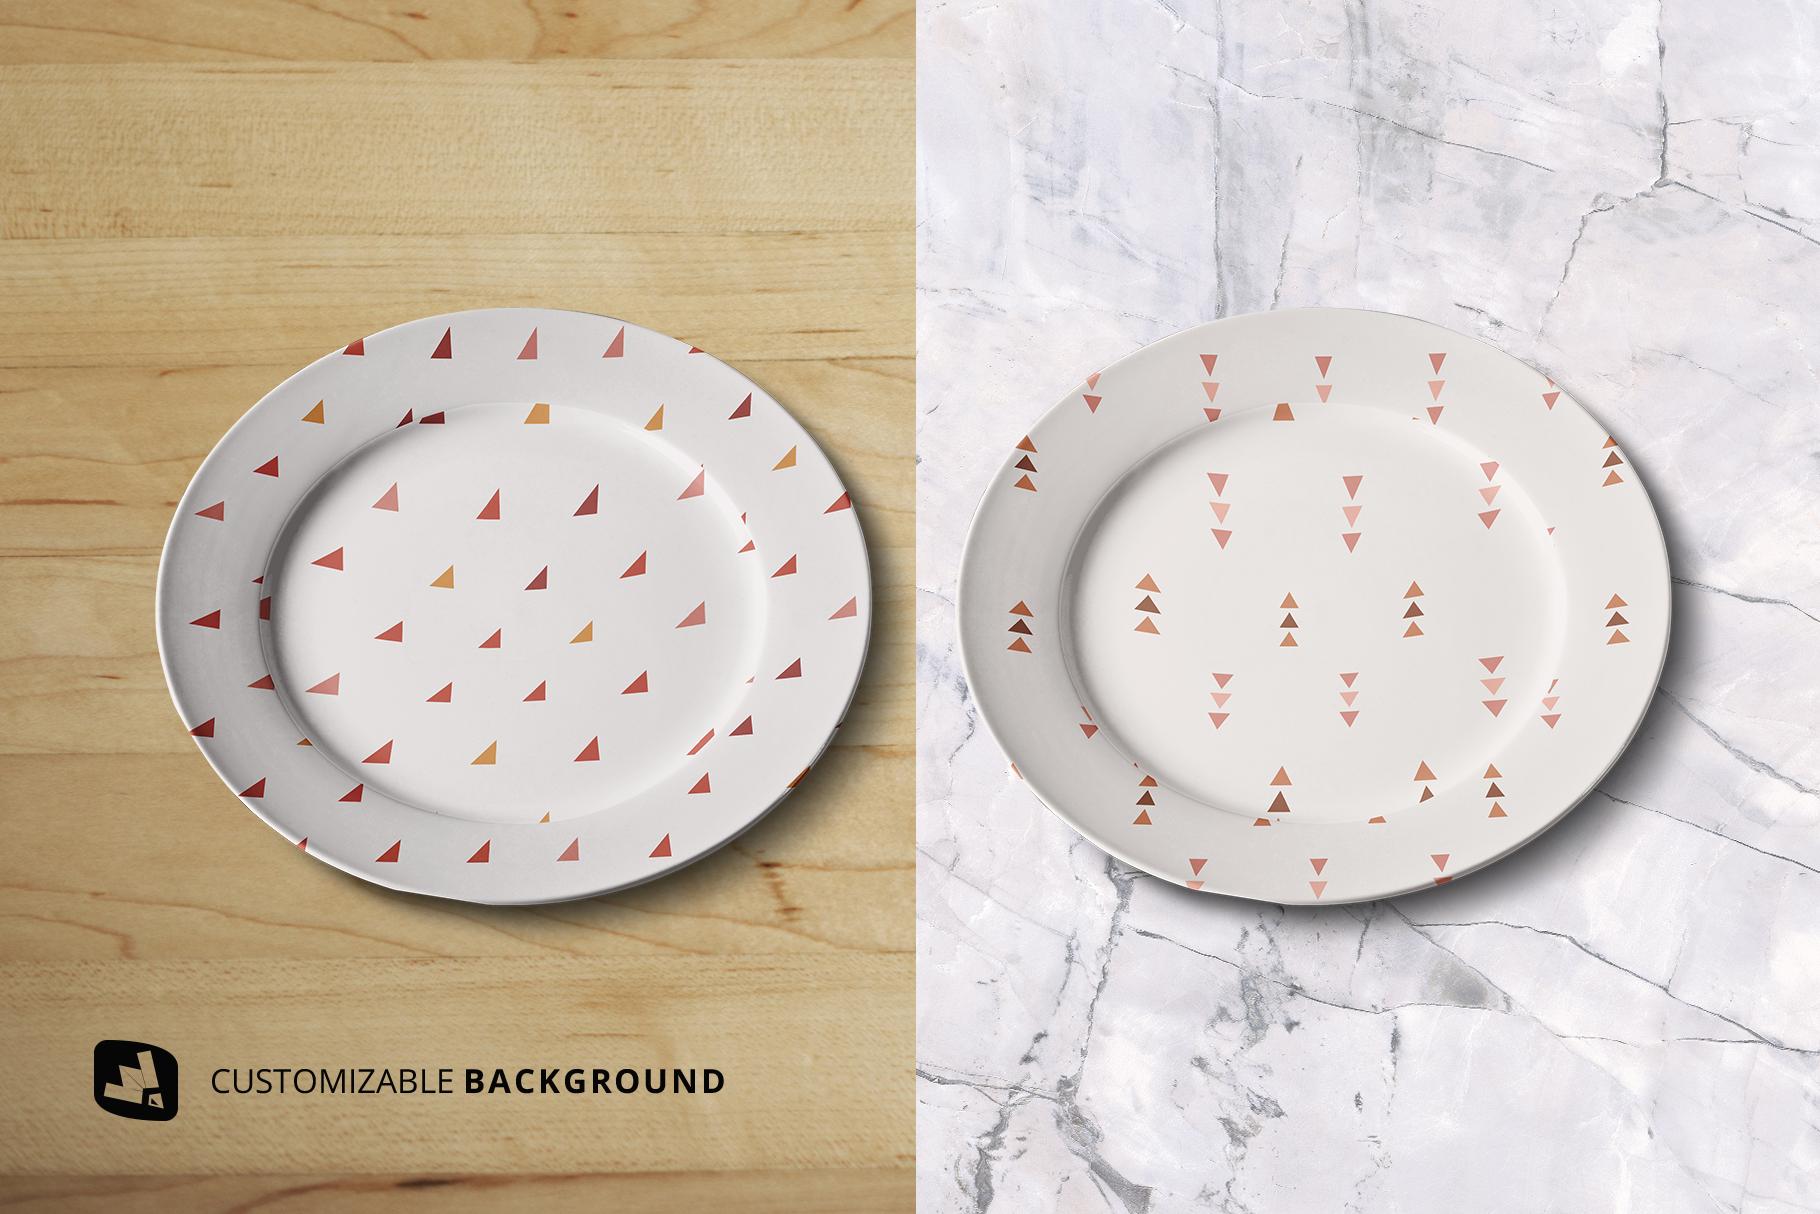 background options of the porcelain dinner plate mockup